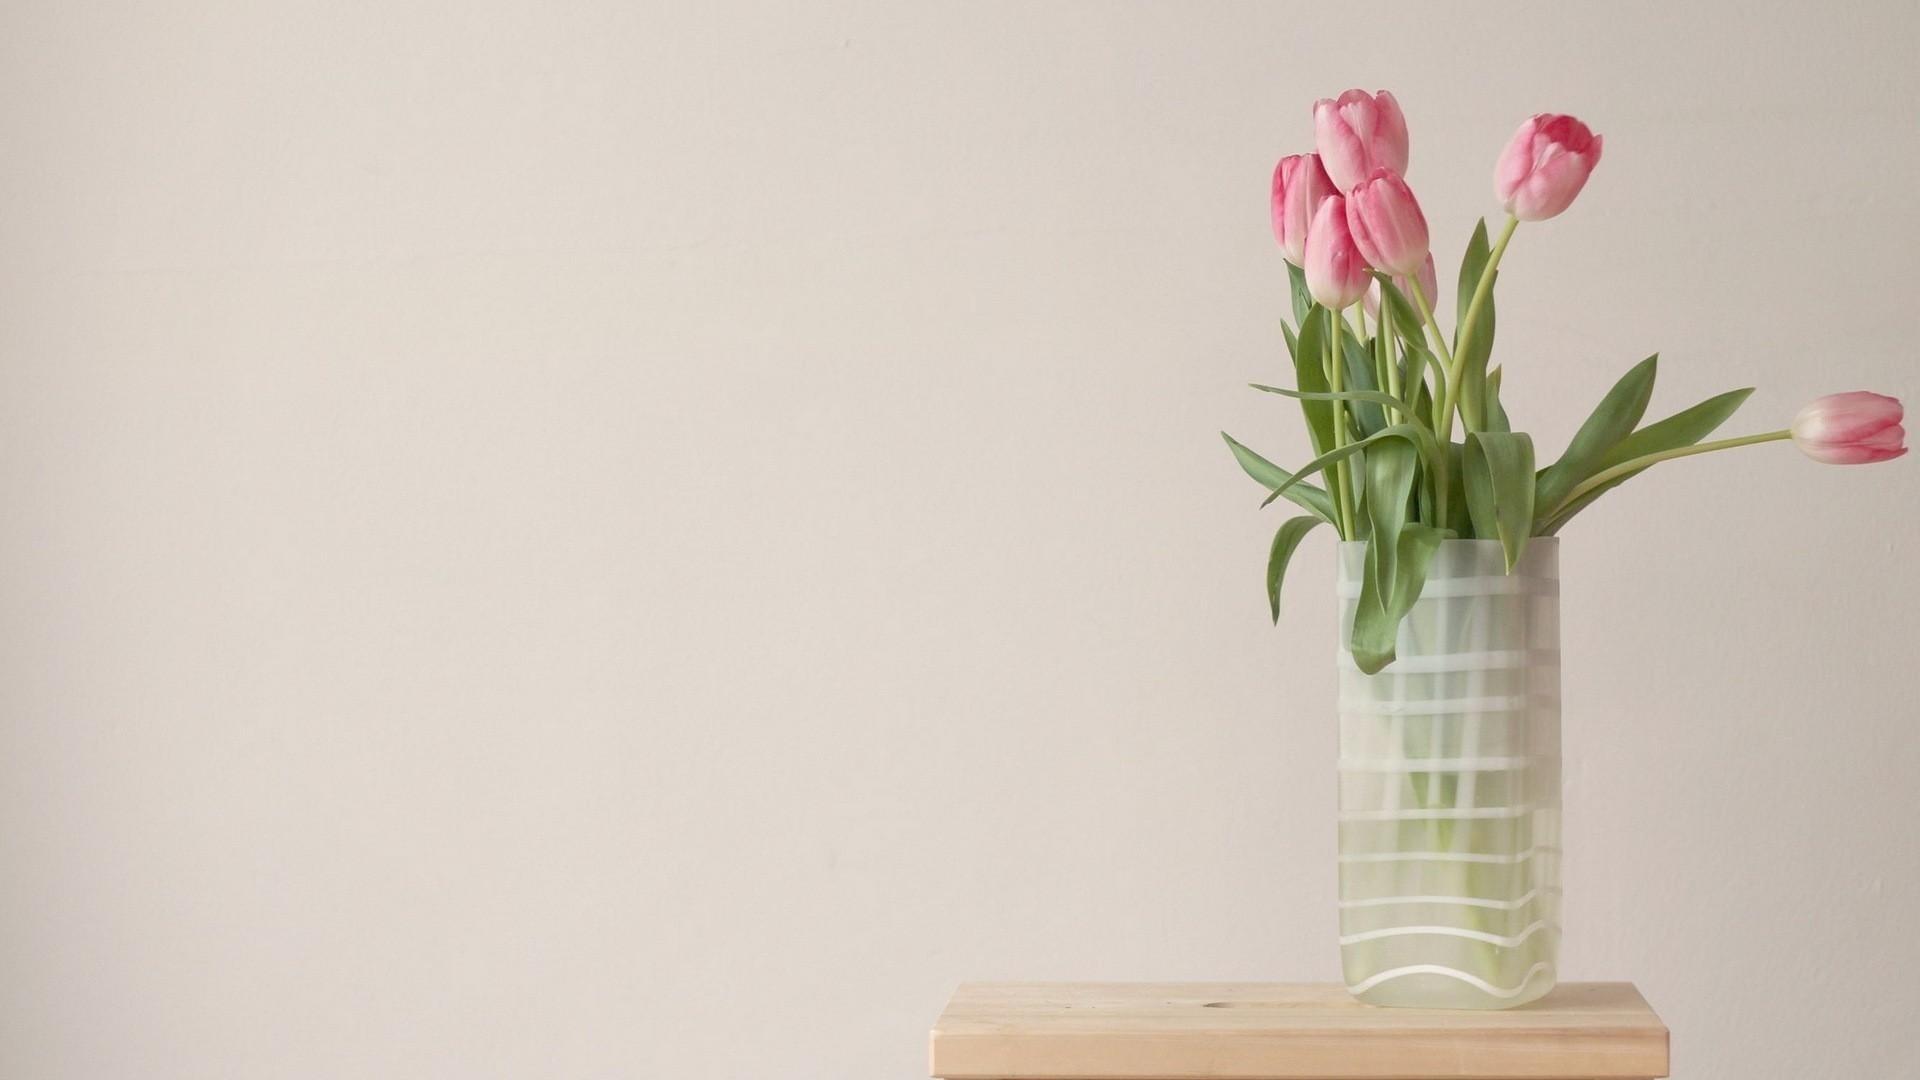 Flower Minimalist wallpaper for pc